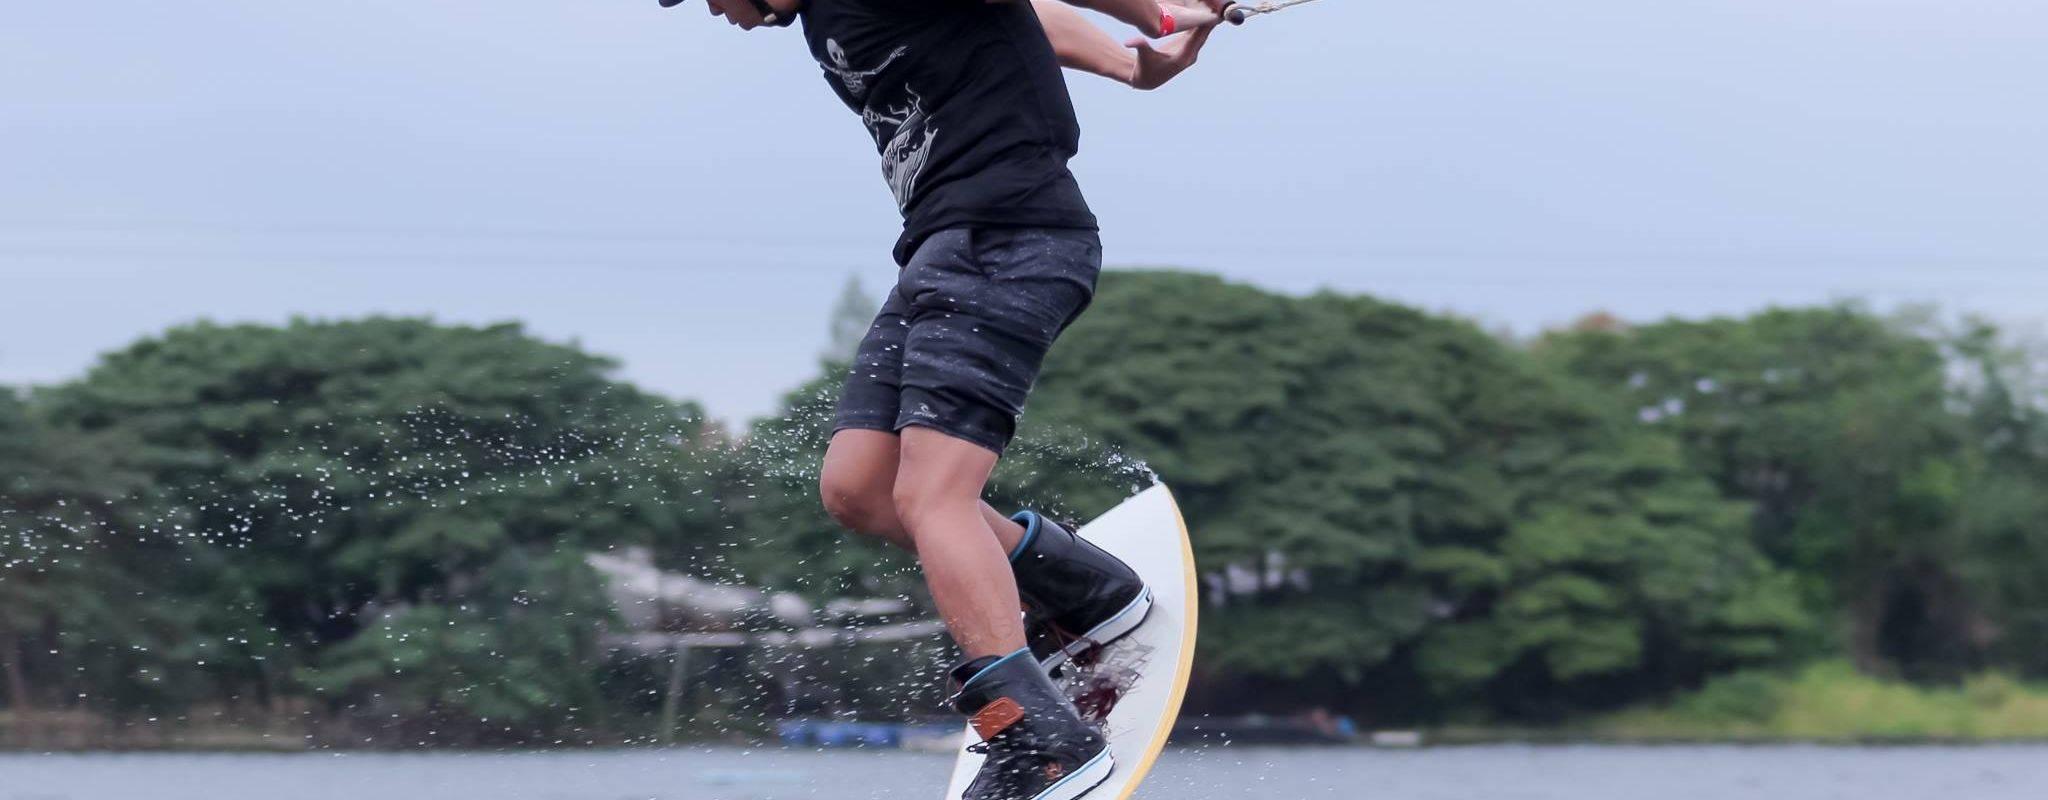 Challenge yourself with Wakeboarding!